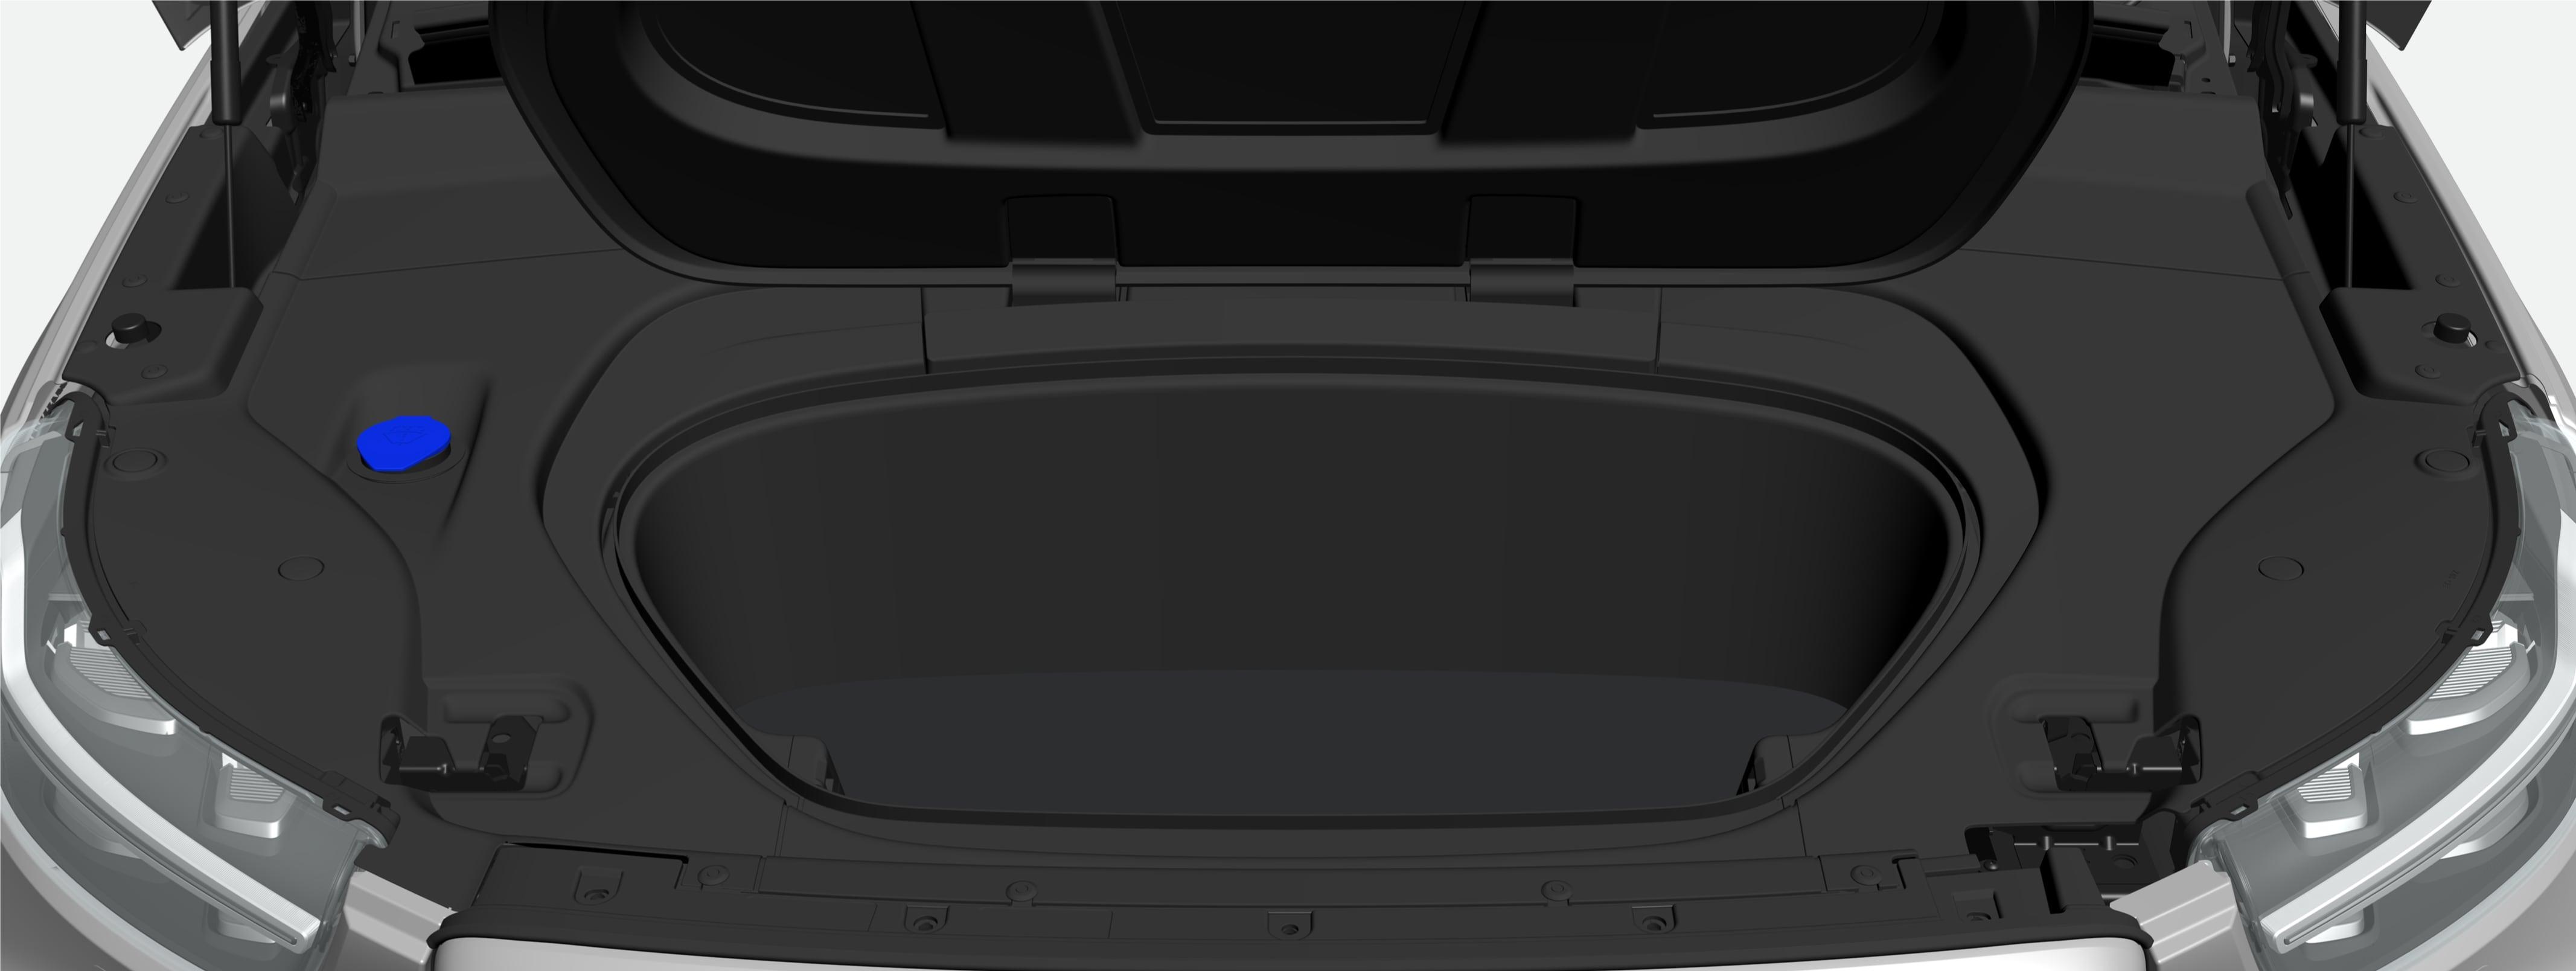 P6-2122-XC40BEV-iCup-Frunk overview